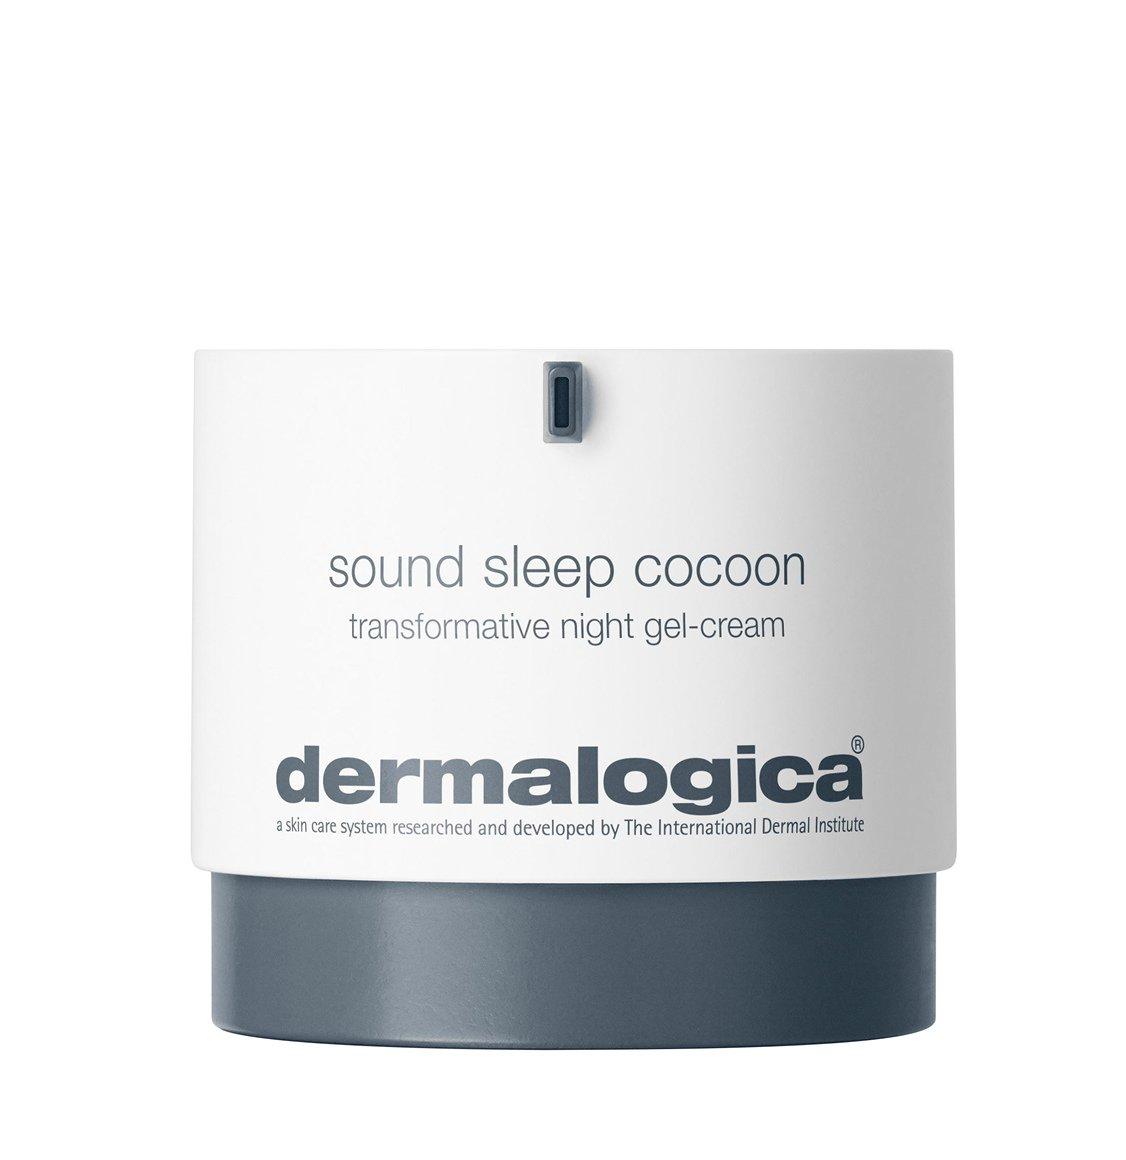 Dermalogica Night Gel-Cream 50ml